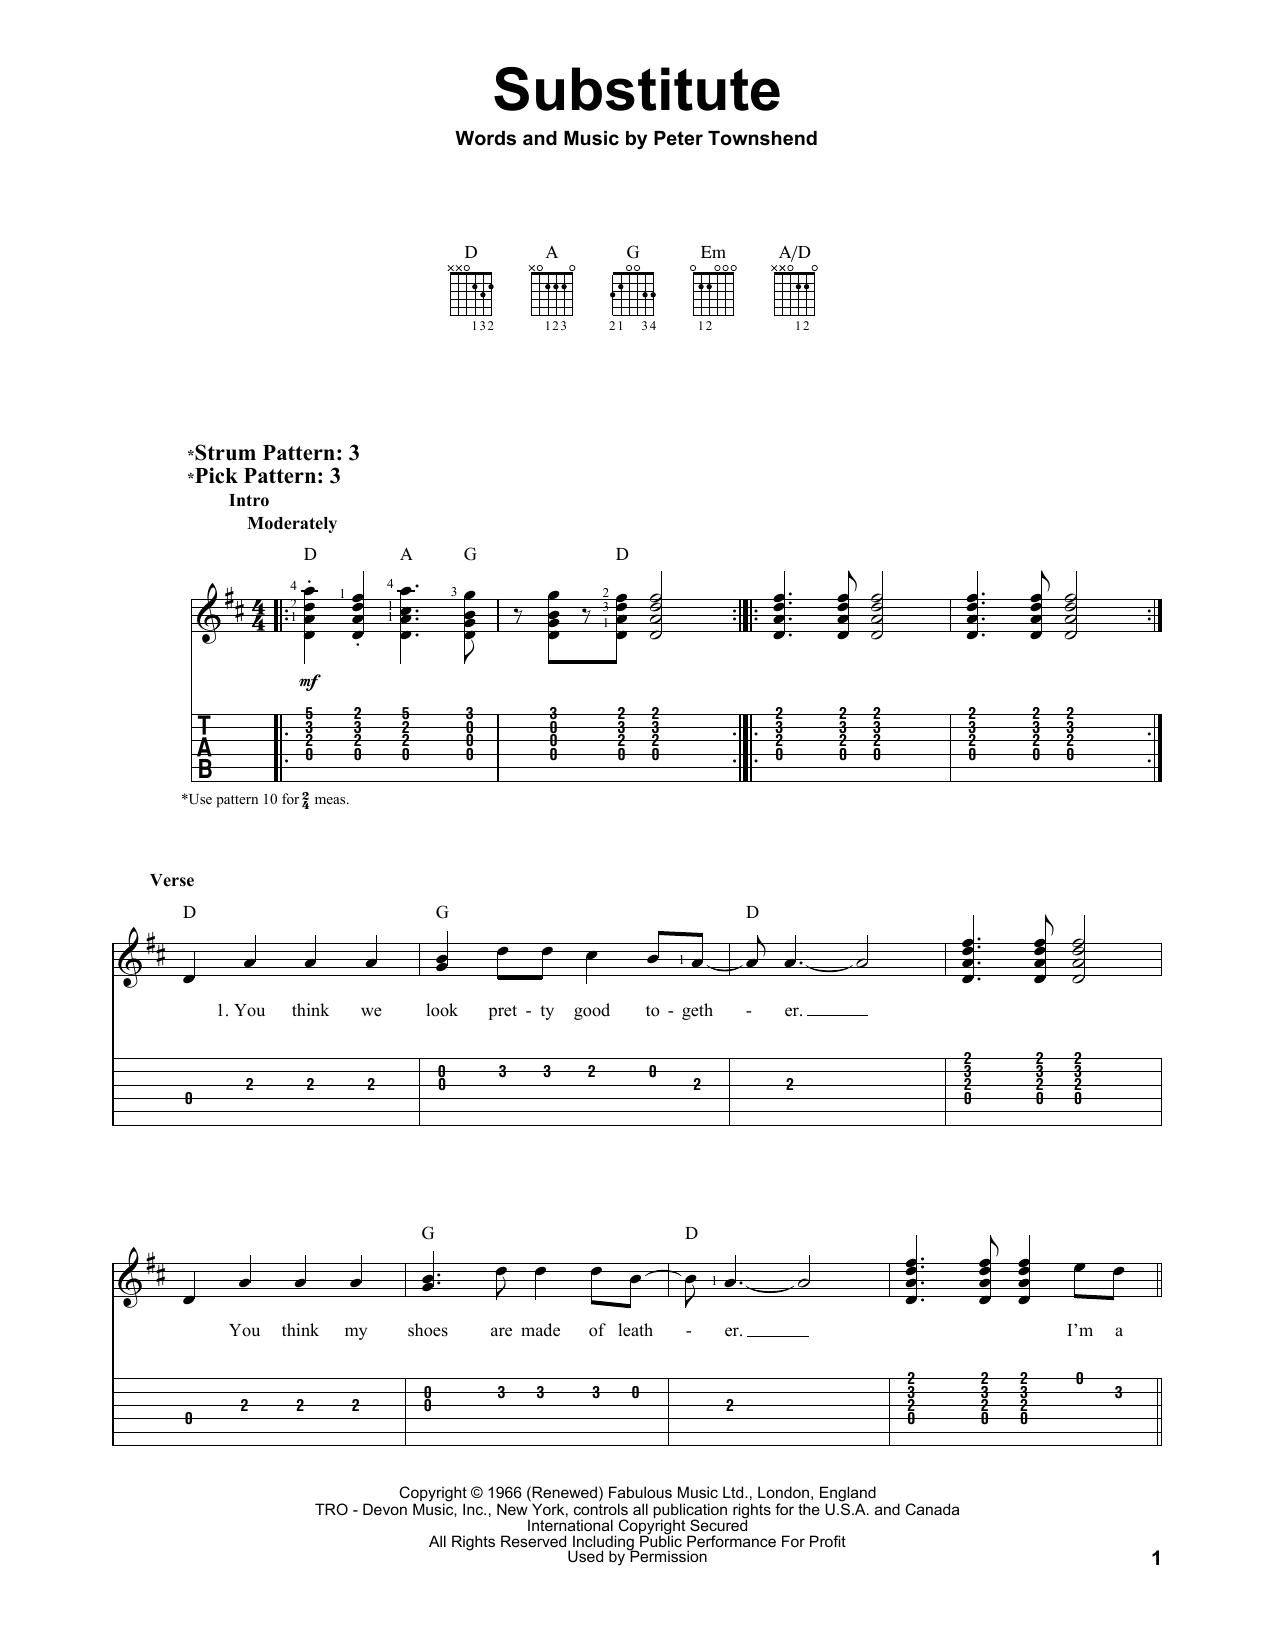 Substitute sheet music